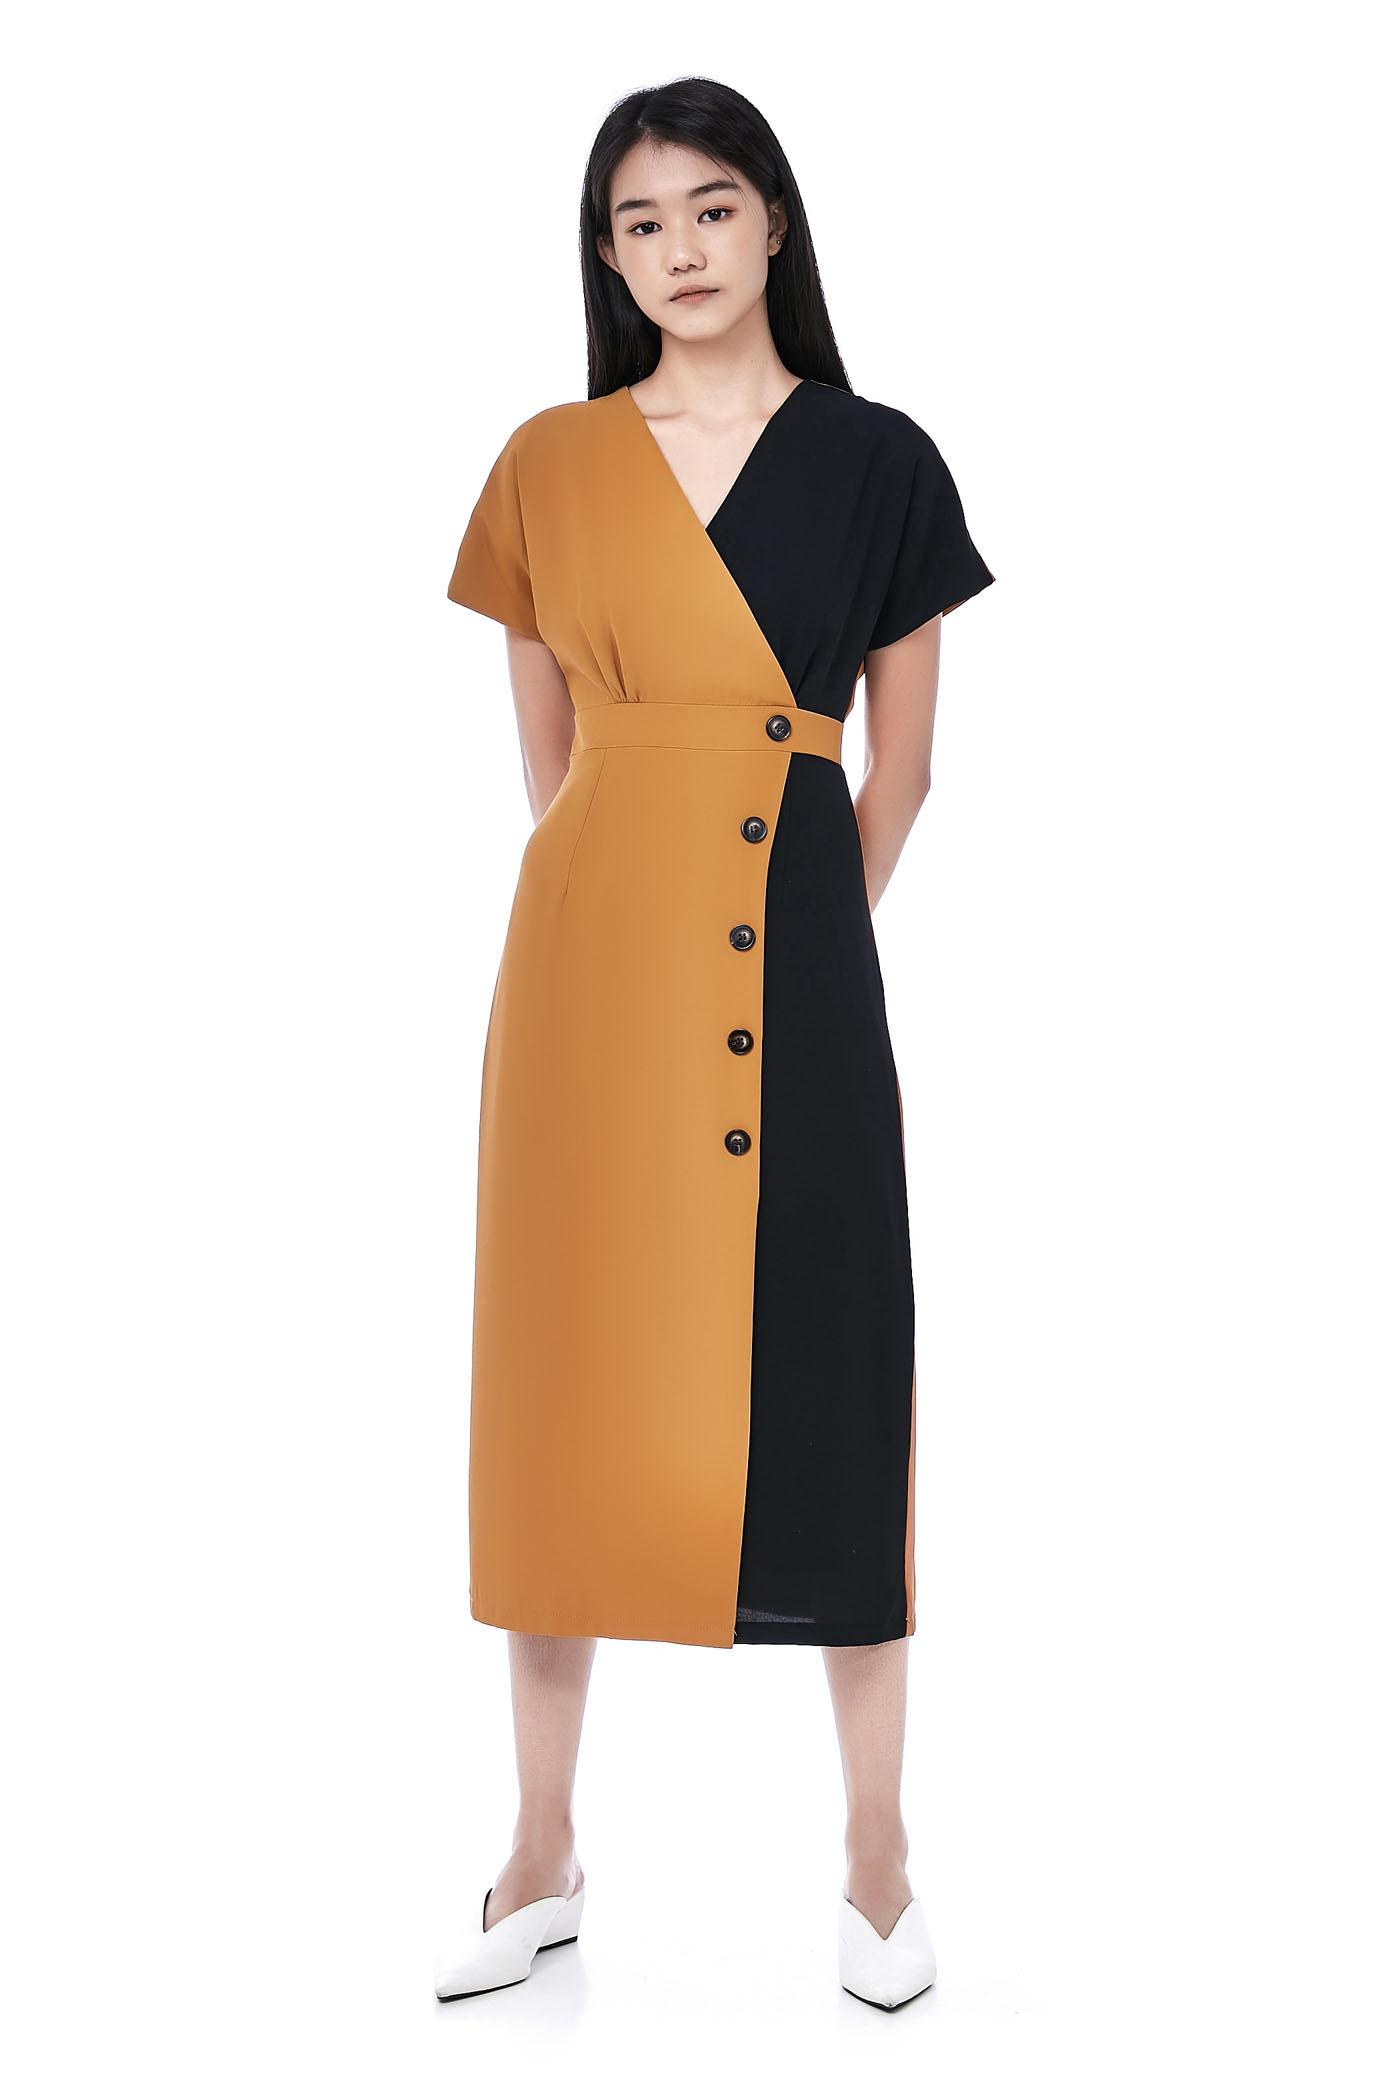 Pouly Overlap Dress